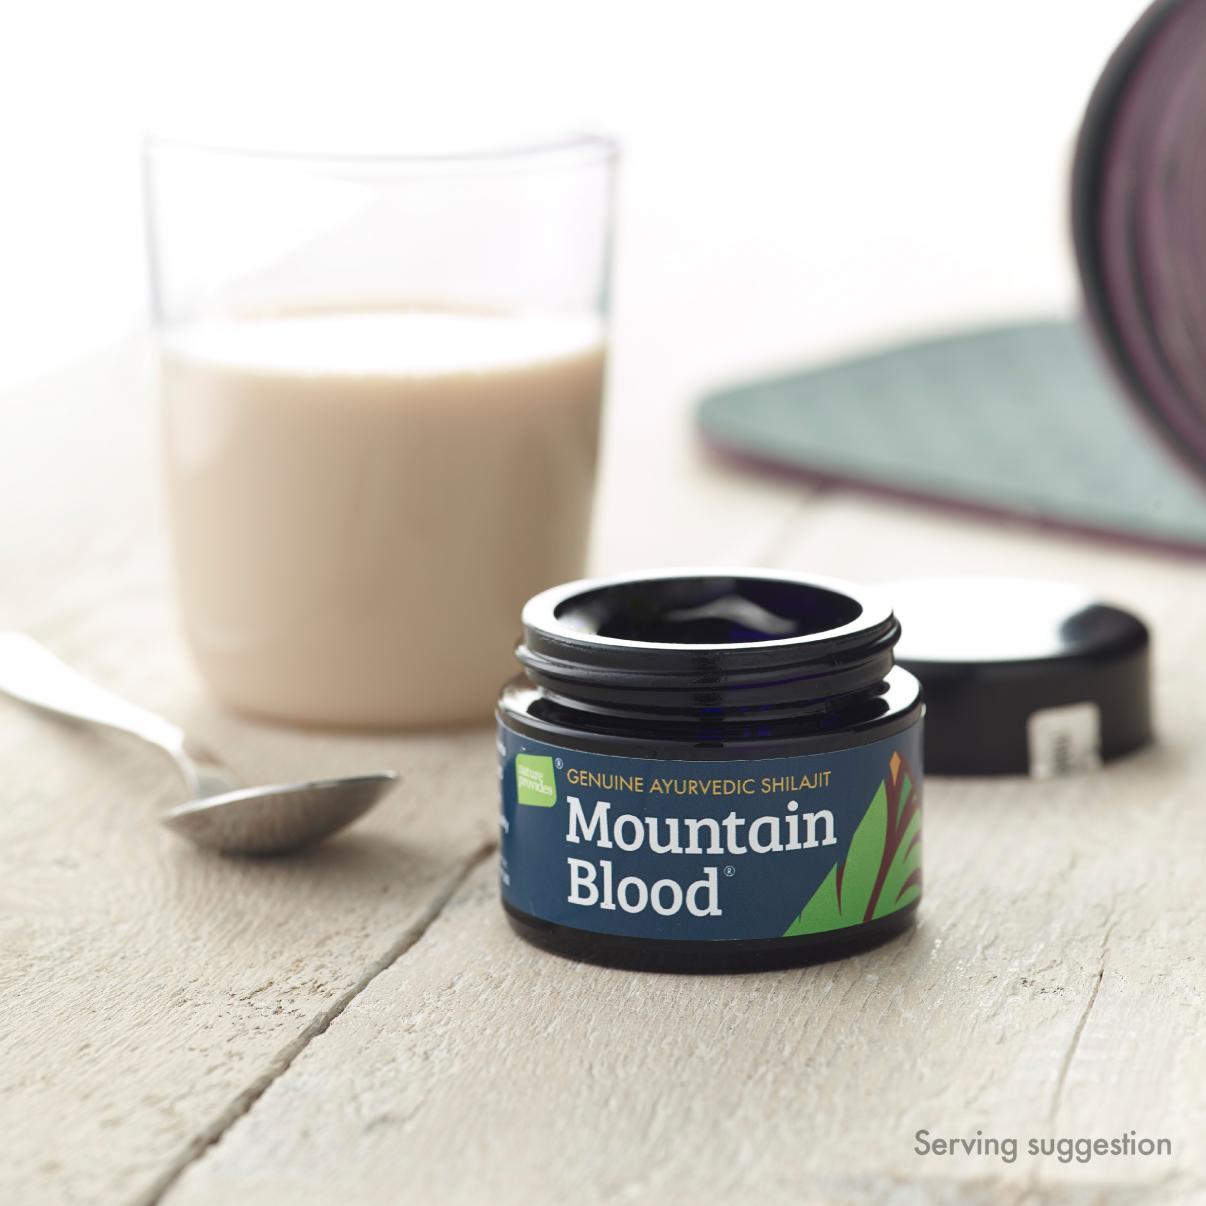 Mountain Blood Shilajit 30g